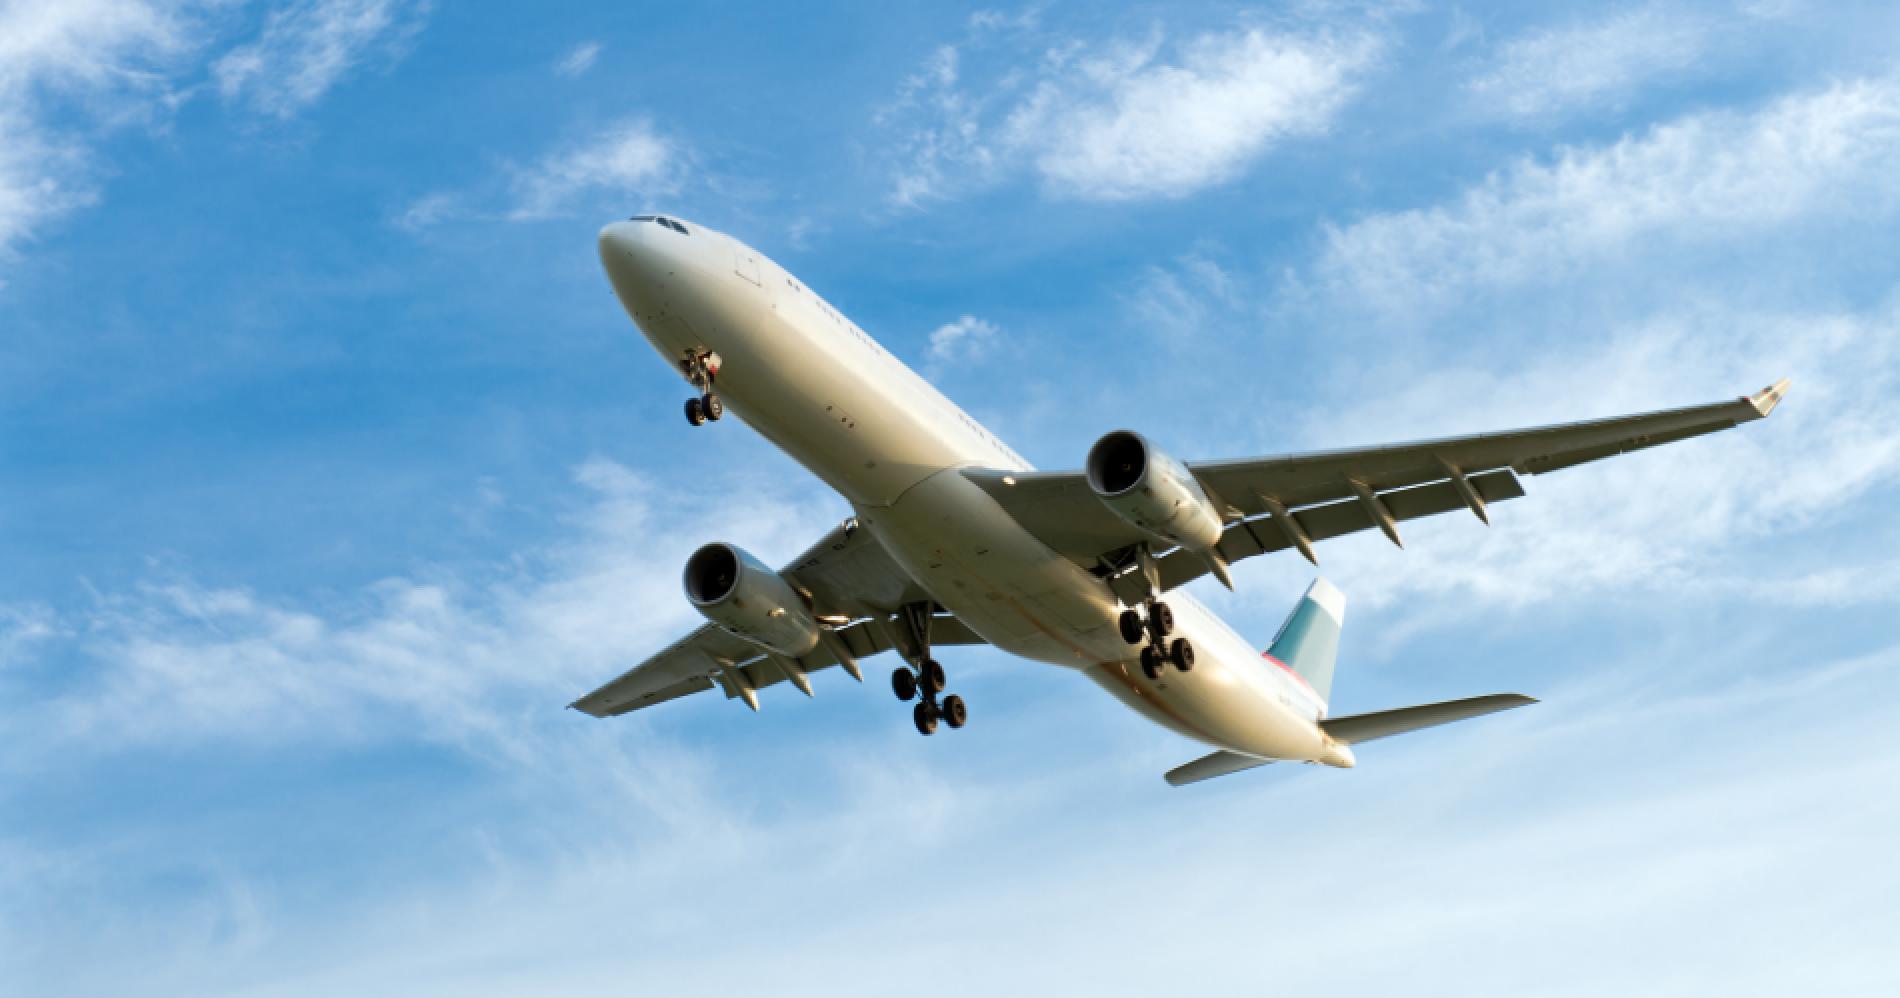 Aviation Illustration Web Bisnis Muda - Canva